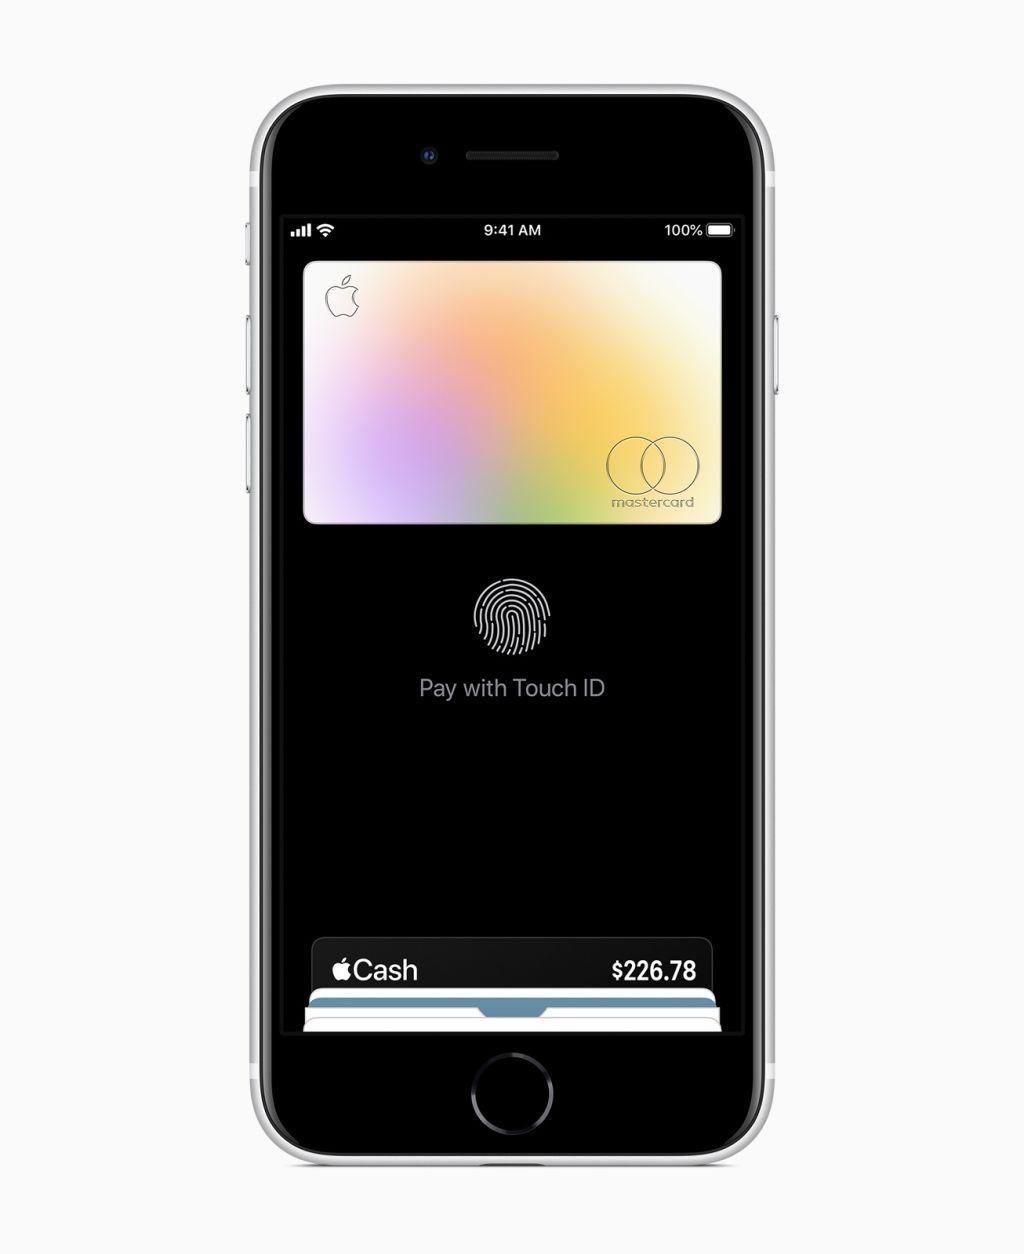 Second Generation iPhone SE